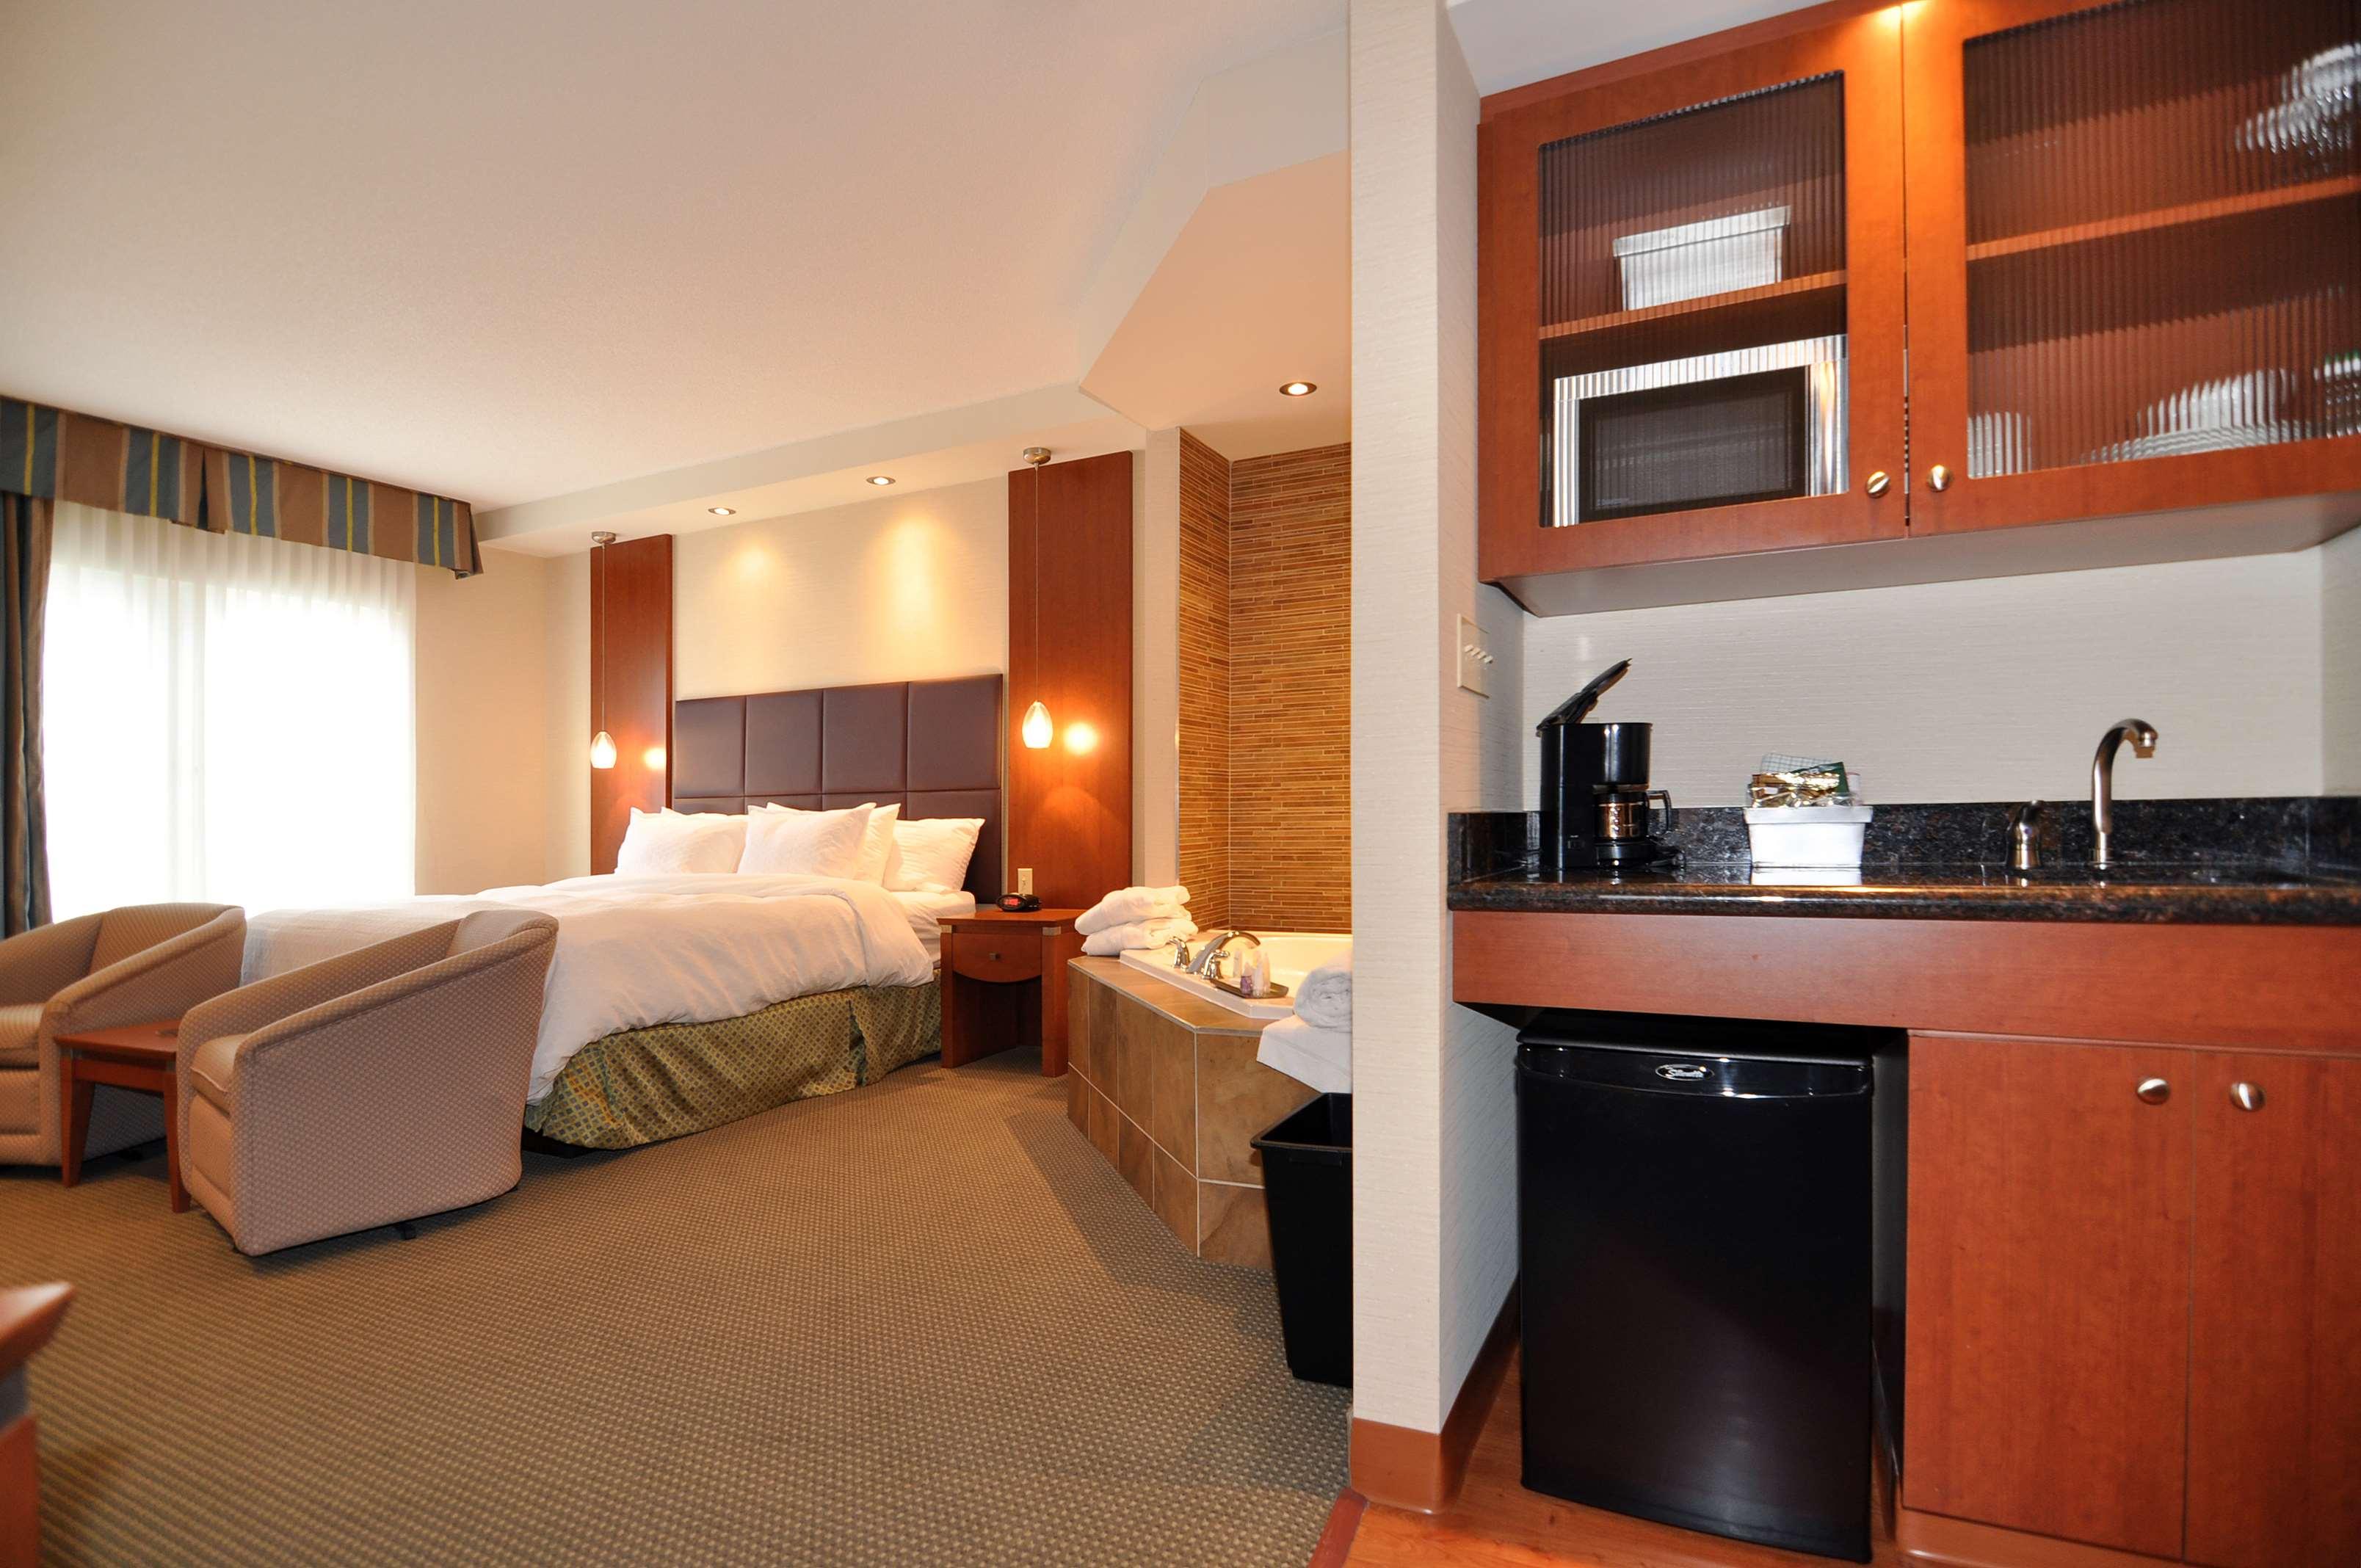 Whirlpool Guest Room Best Western Plus Orangeville Inn & Suites Orangeville (519)941-3311